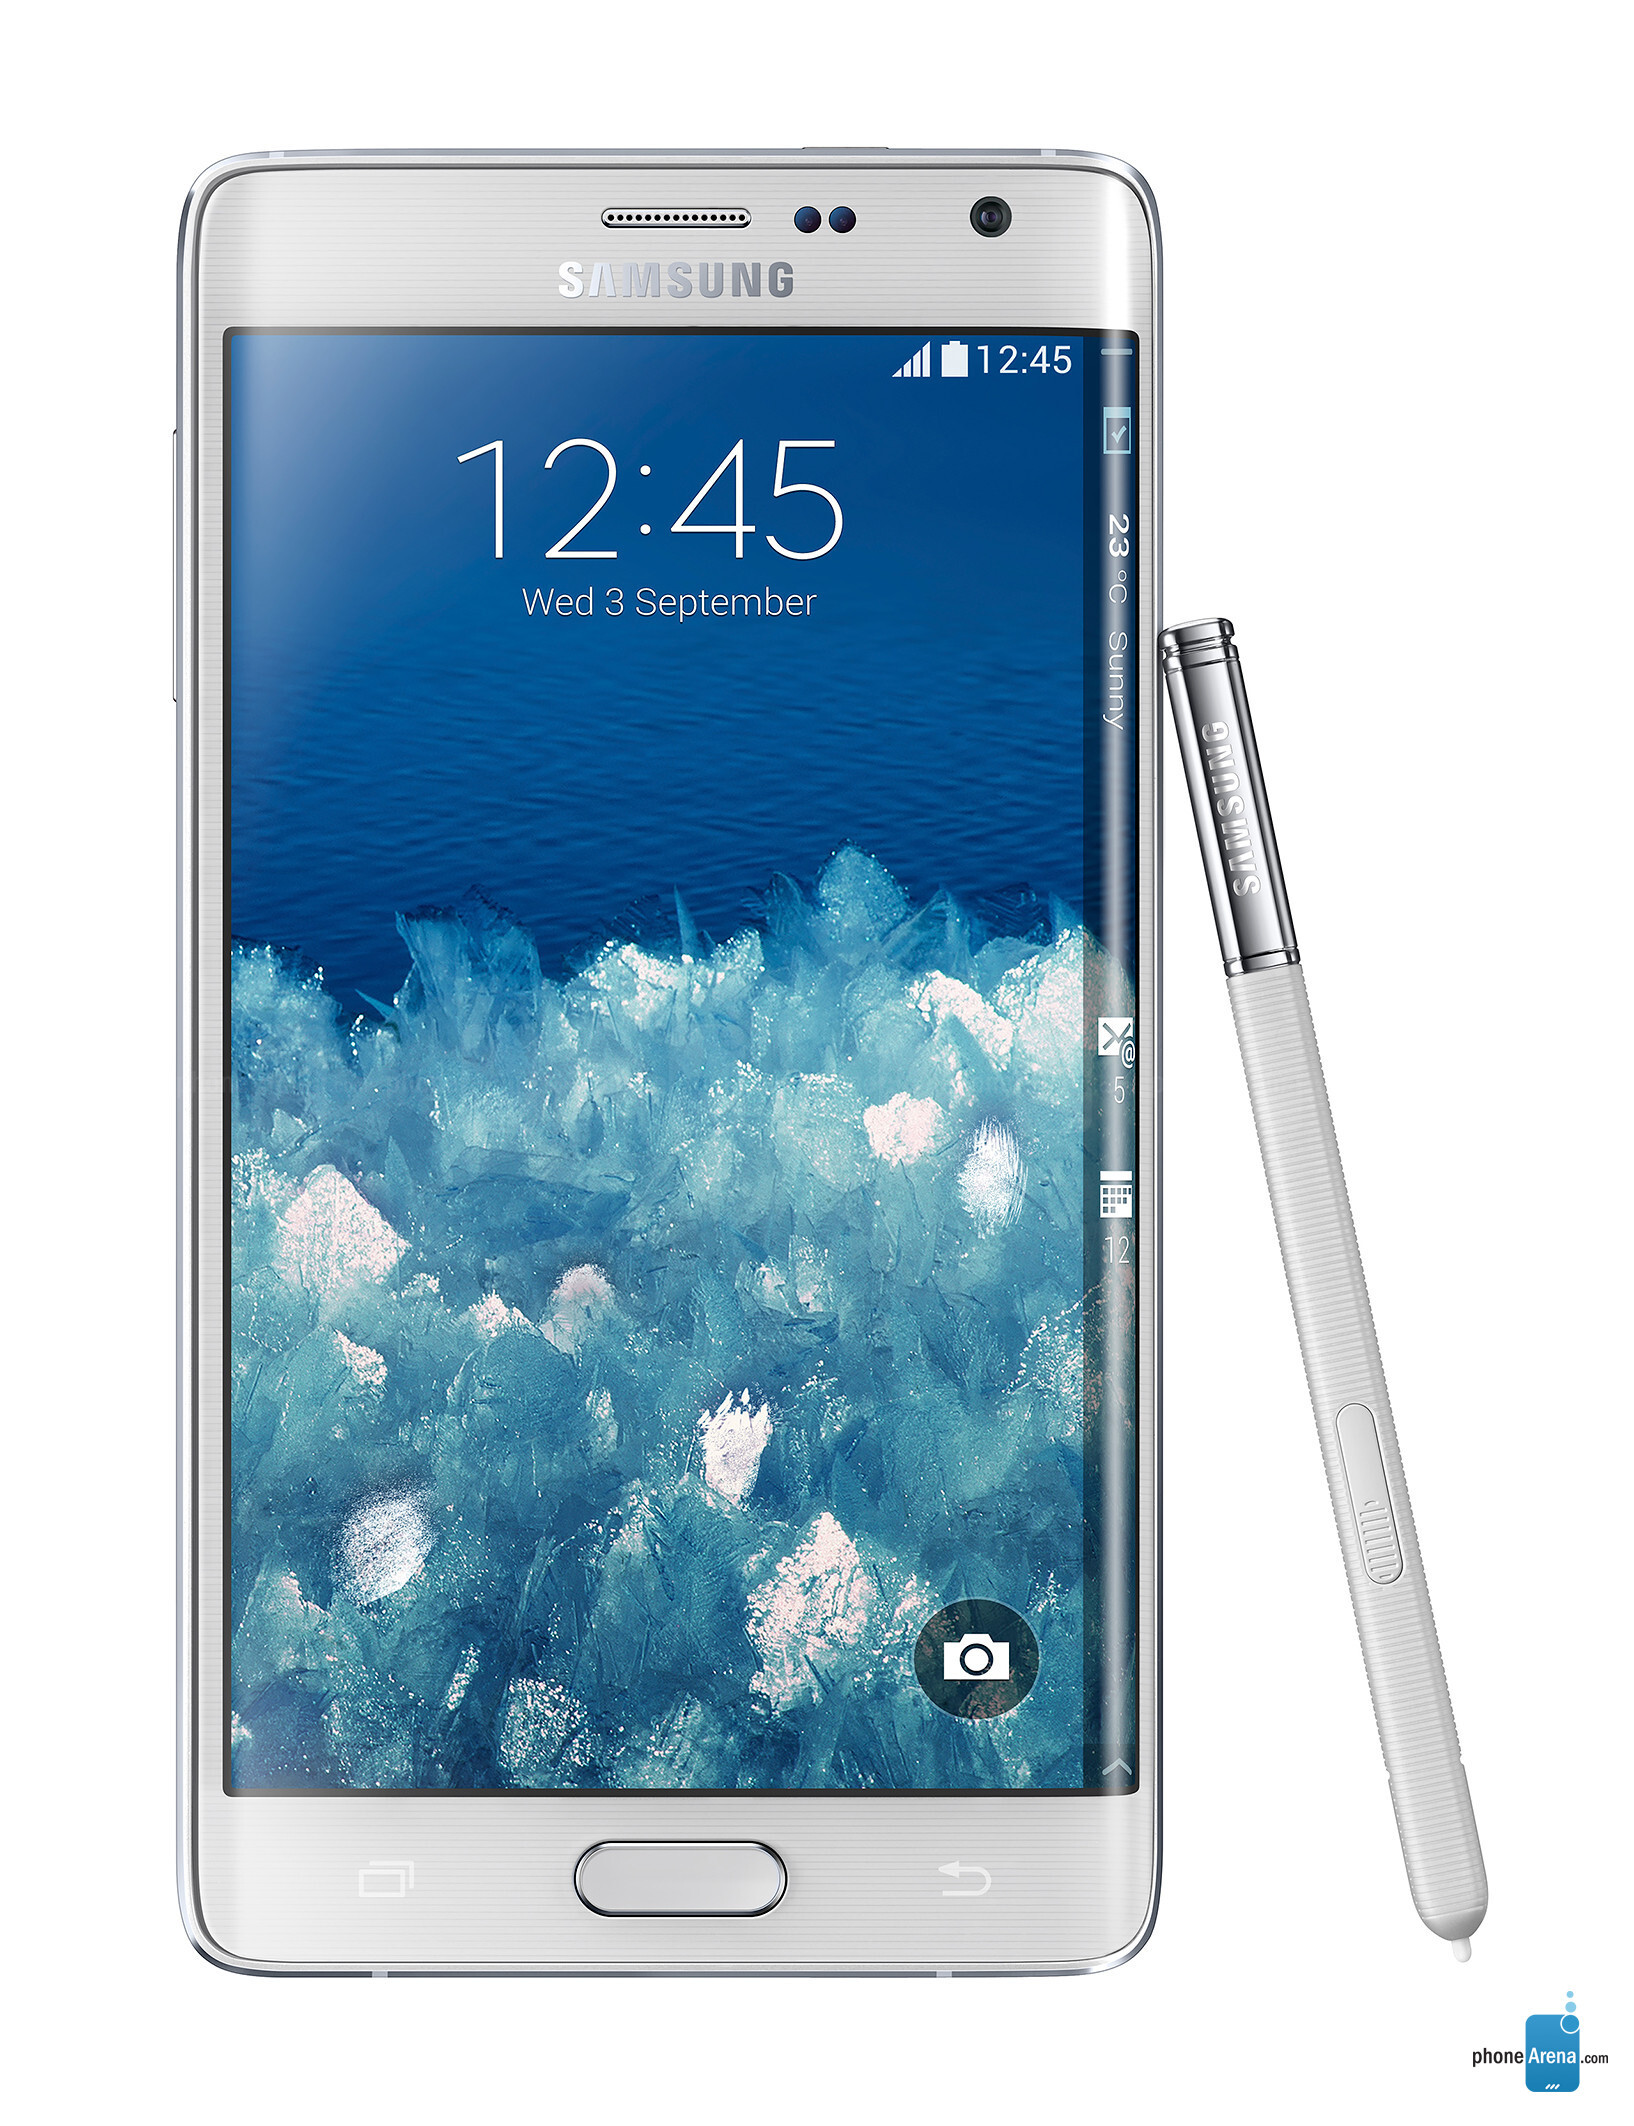 Samsung galaxy note edge photos stopboris Image collections